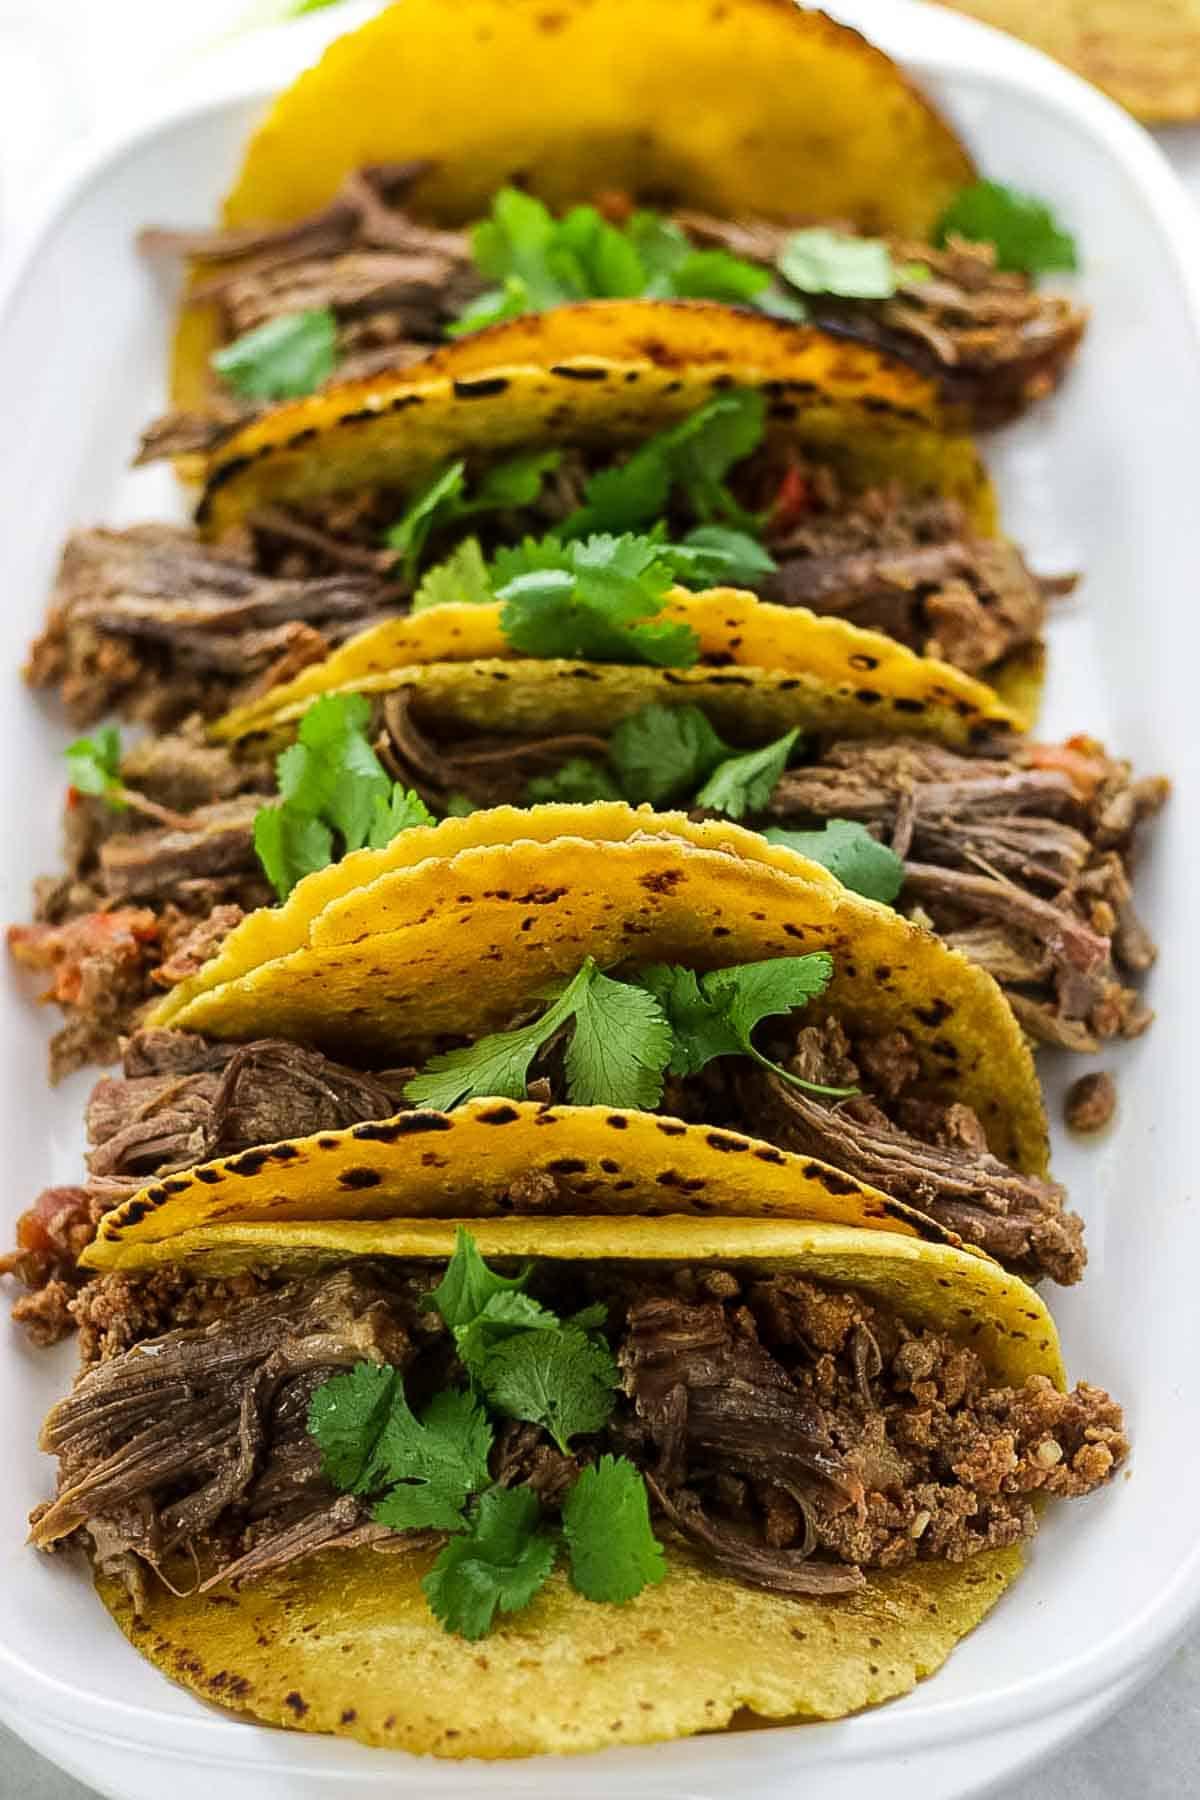 Shredded Beef Tacos in corn tortillas with cilantro